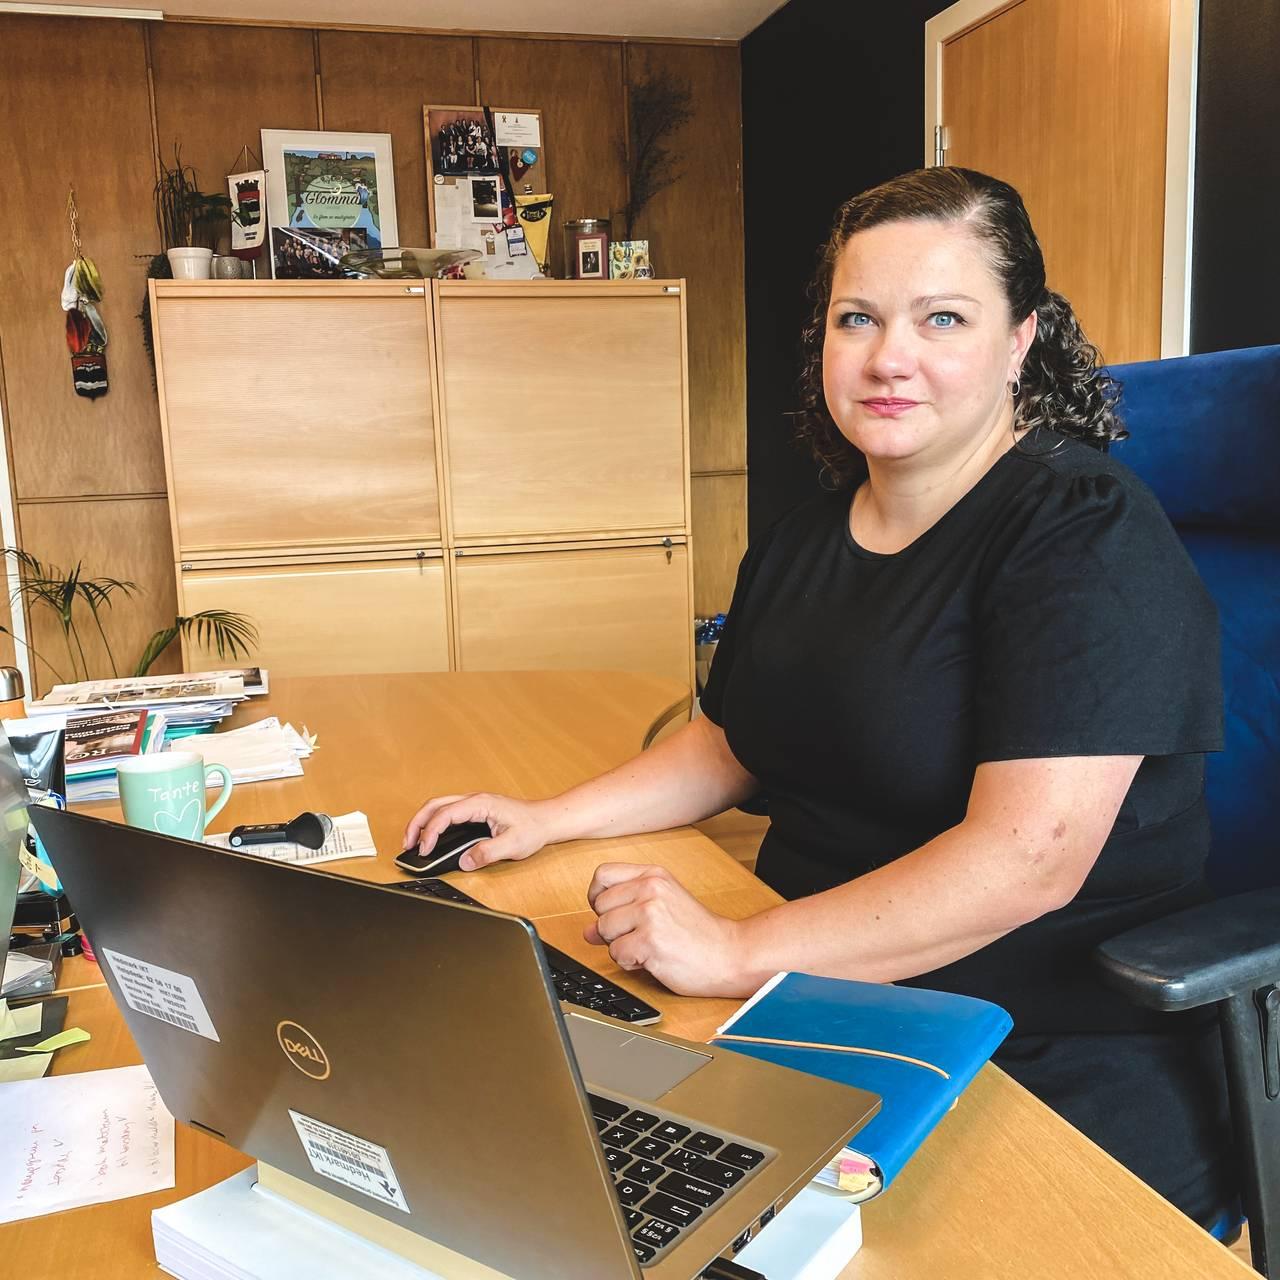 Sp-ordføreren i Kongsvinger, Margrethe Haarr.